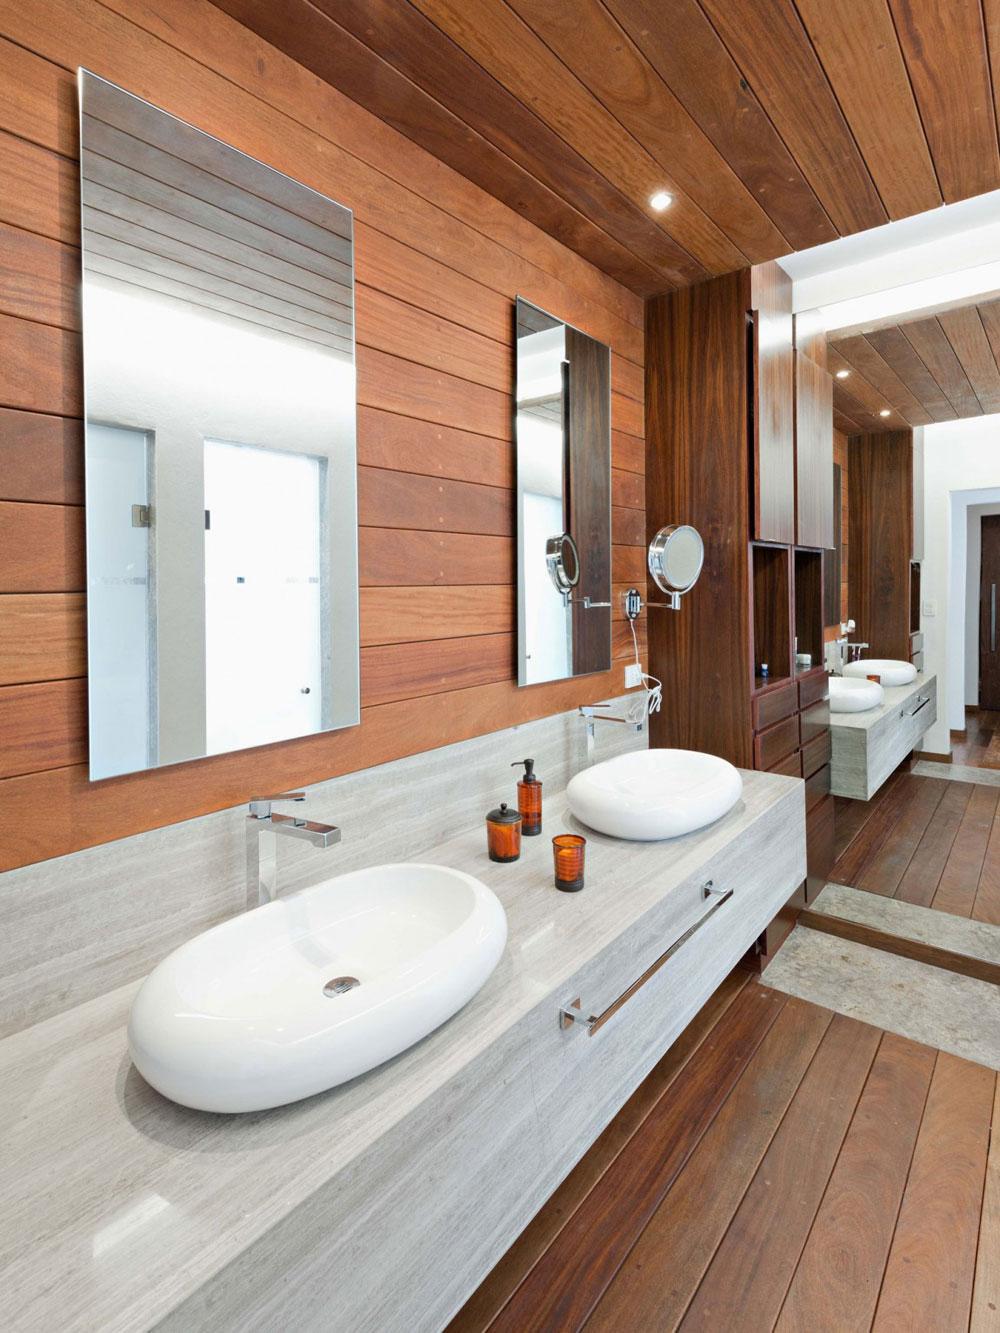 Contemporary Interior Design Styles To Choose From For Your Home-7 Contemporary Interior Design Styles To Choose From For Your Home